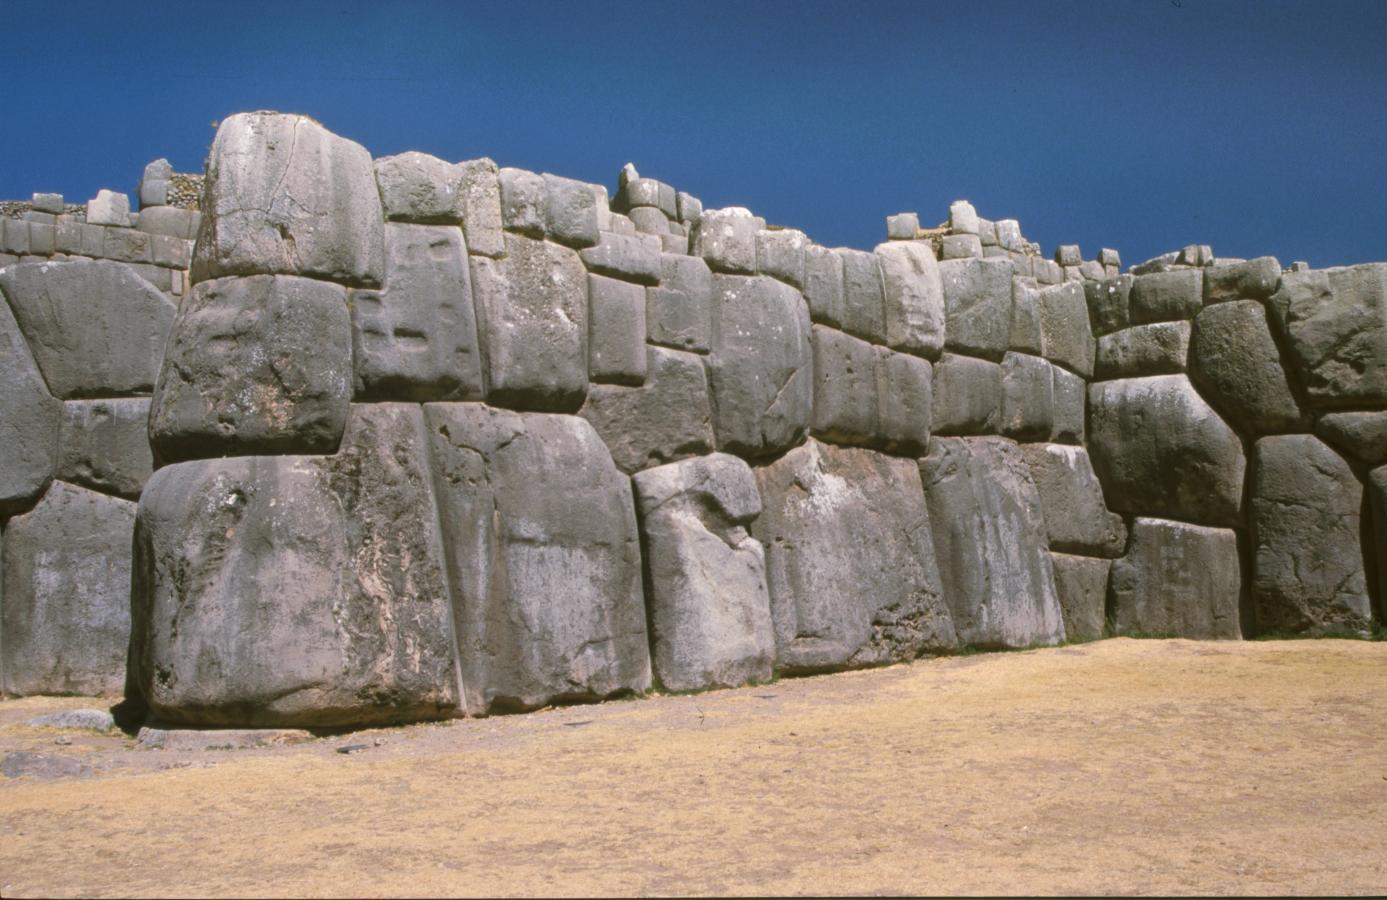 big-stones-saqsayhuaman-peru-2001